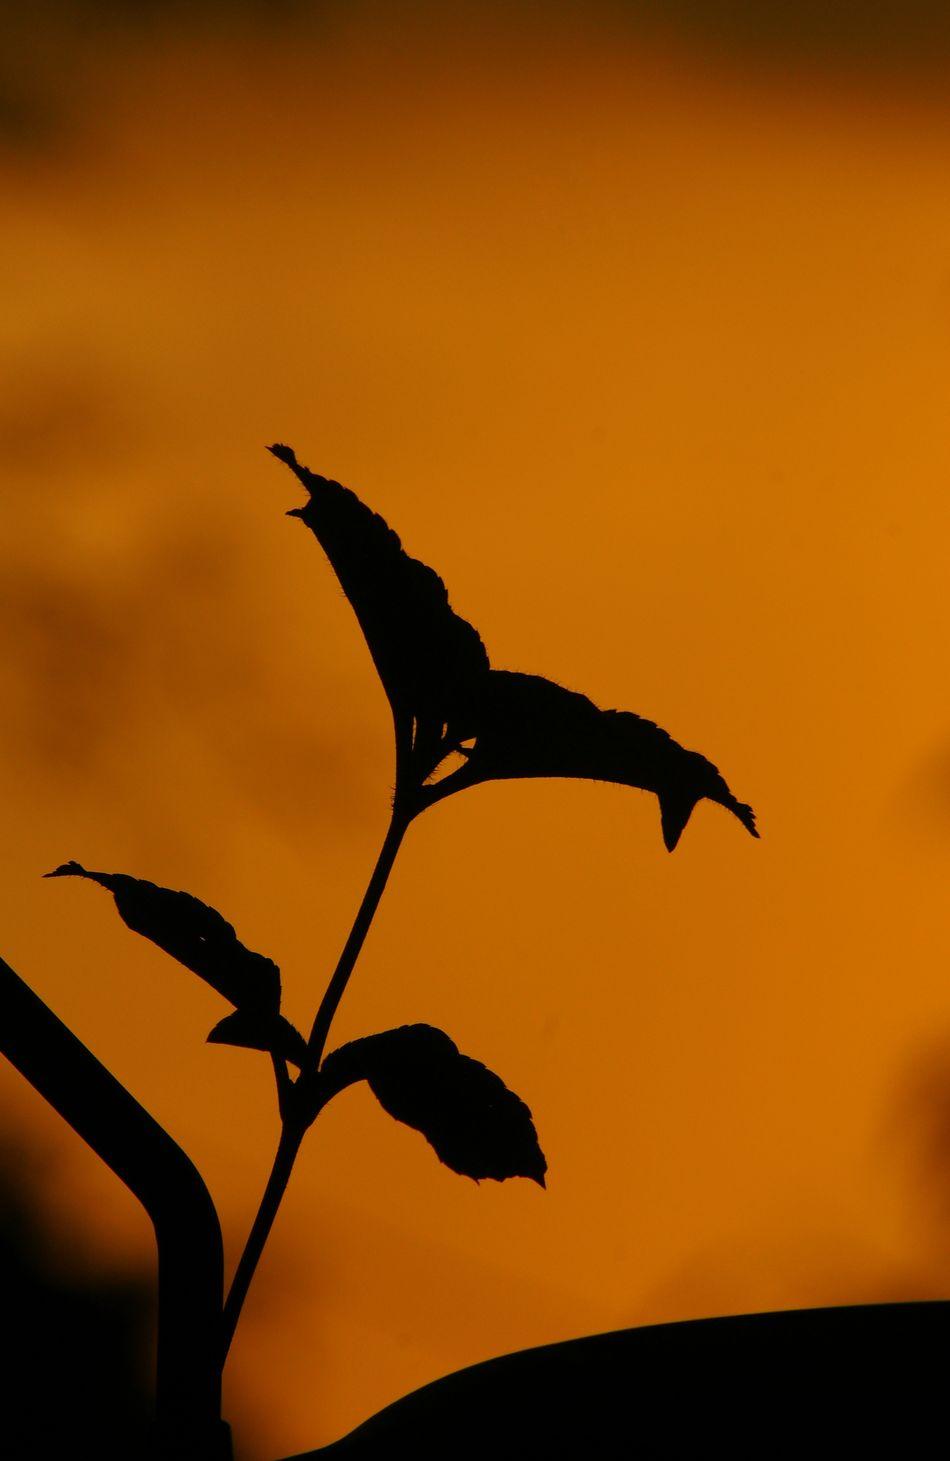 Sunset Silhouette Nature Alpha700 Sonyphotography Siluetes Sunsetlovers 70-300mm Tamronlens Sunsetporn